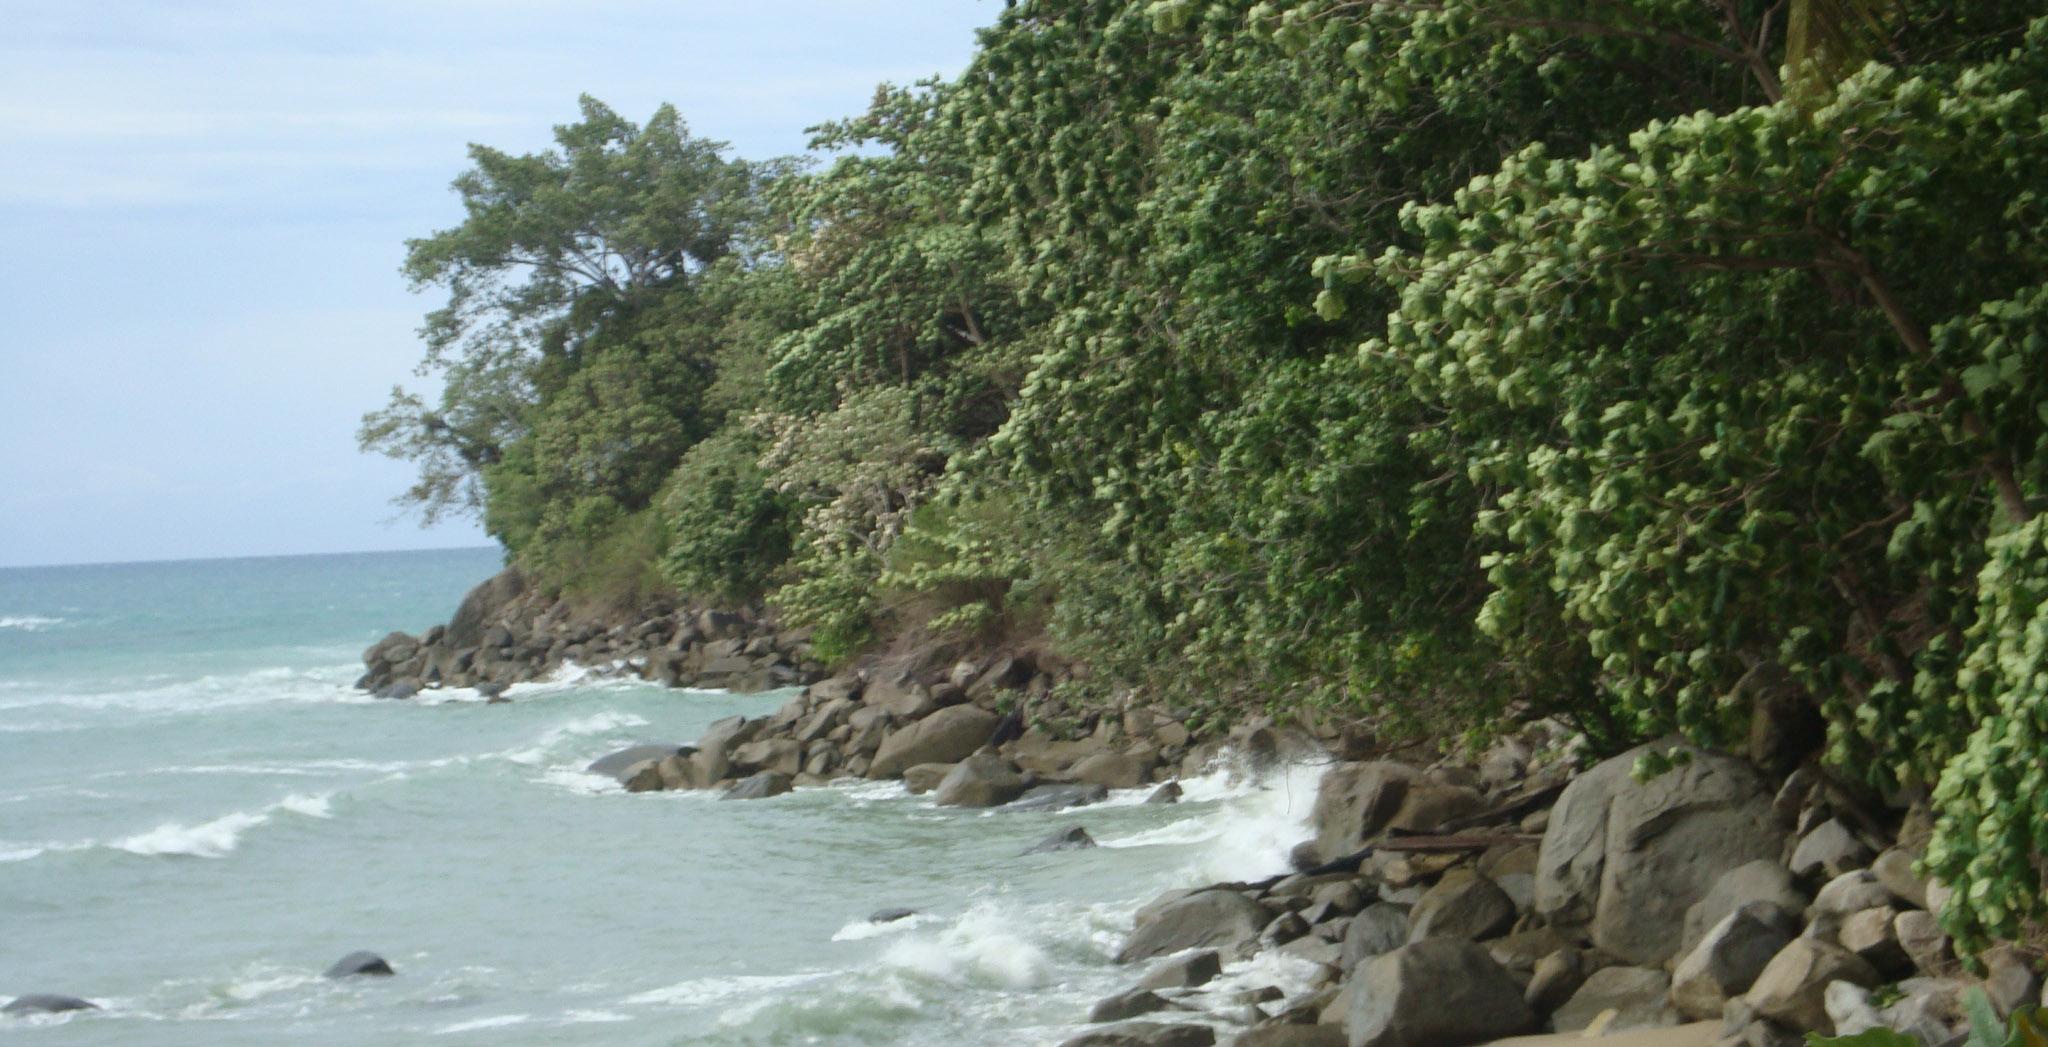 Kenyataan Kawasan Konservasi dan Hutan  Lindung NoerDblog